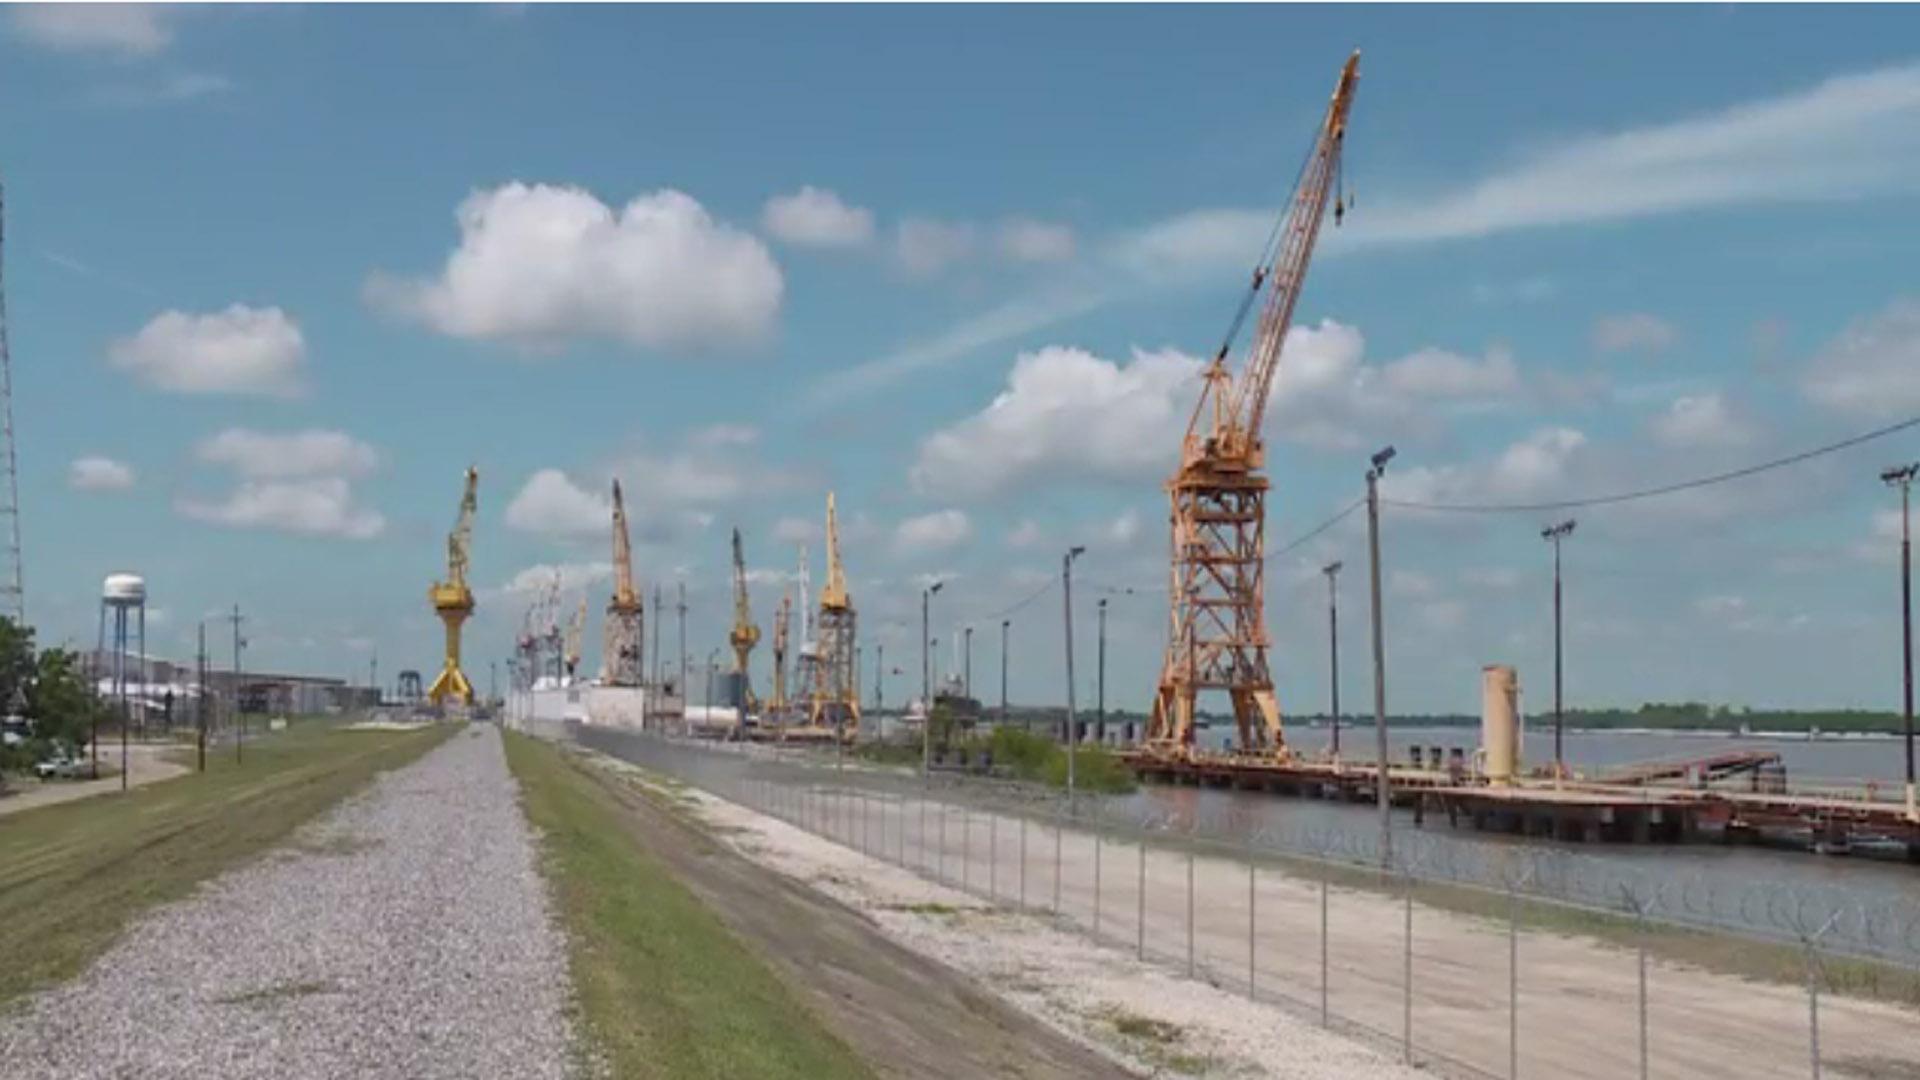 Port Of New Orleans Considering Avondale Site